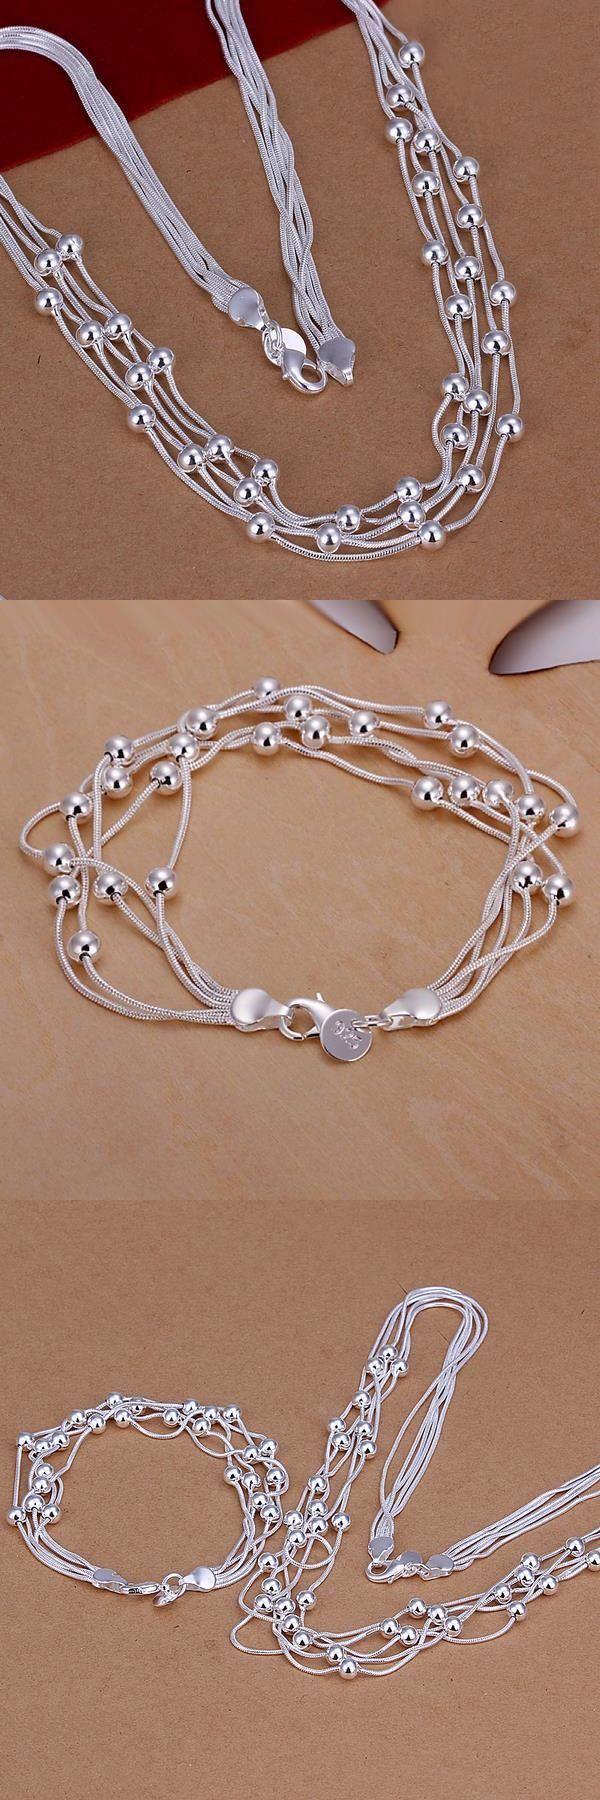 S063 Wholesale Silver set Beads necklace bracelet bridal wedding jewellery set joyas de plata best jewelry